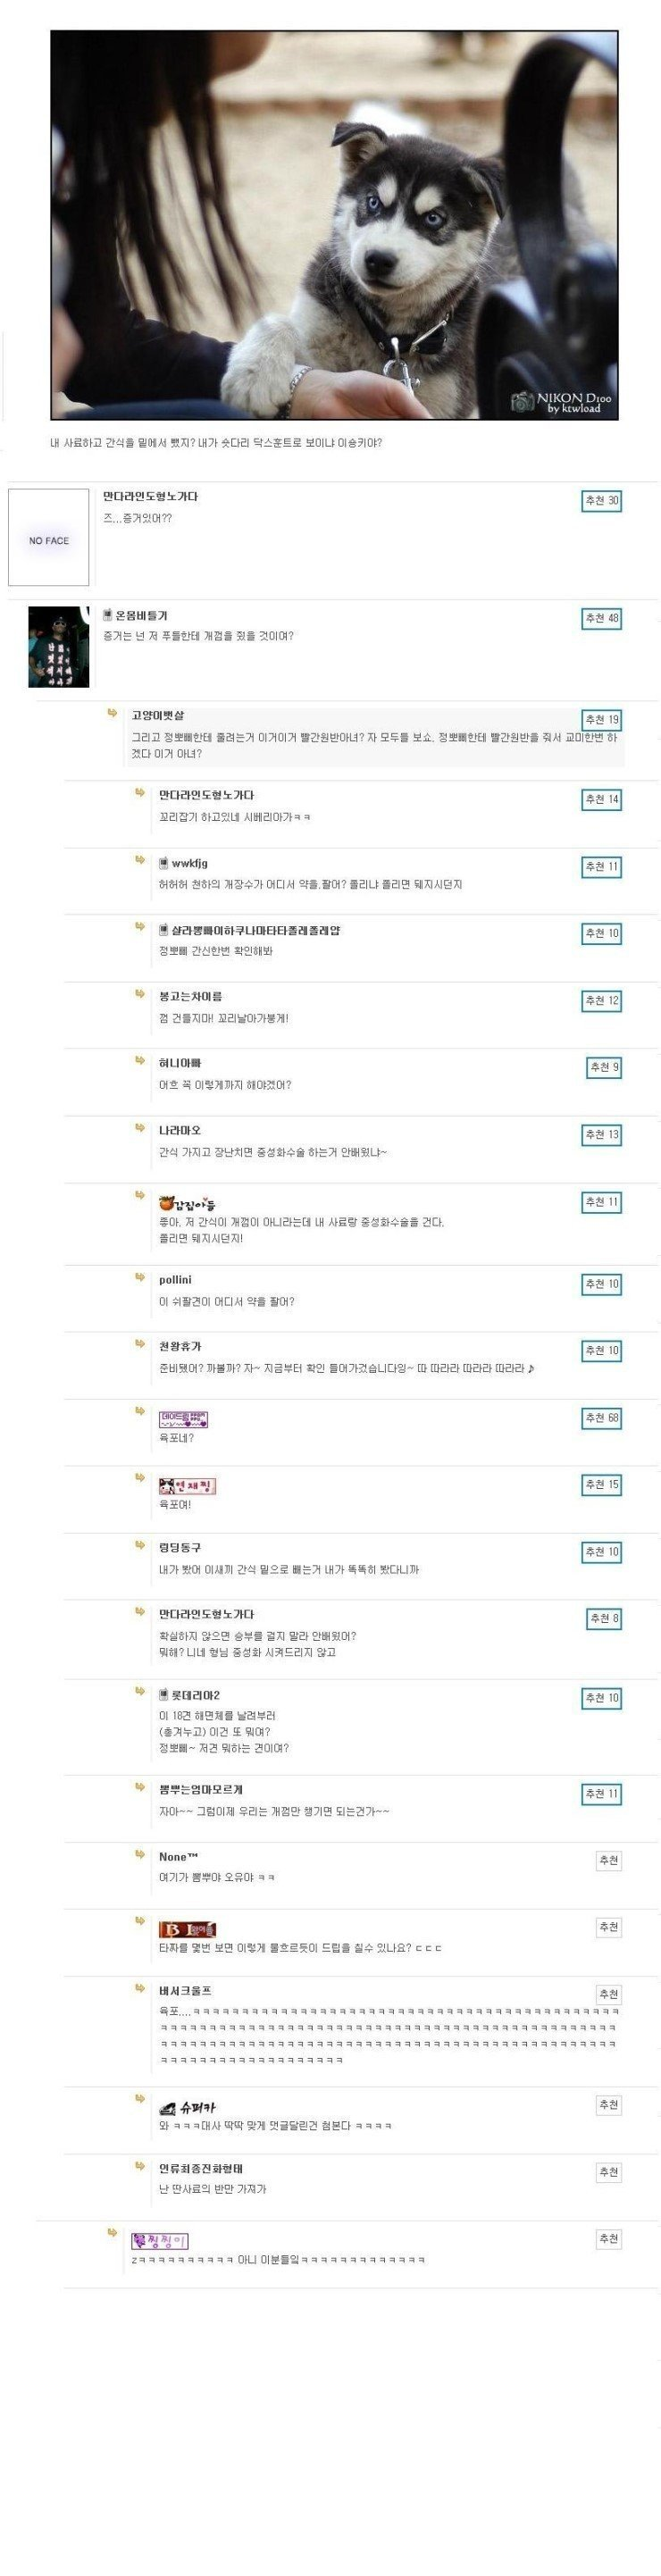 4.jpg 커뮤니티별 타짜 패러디 댓글.jpg